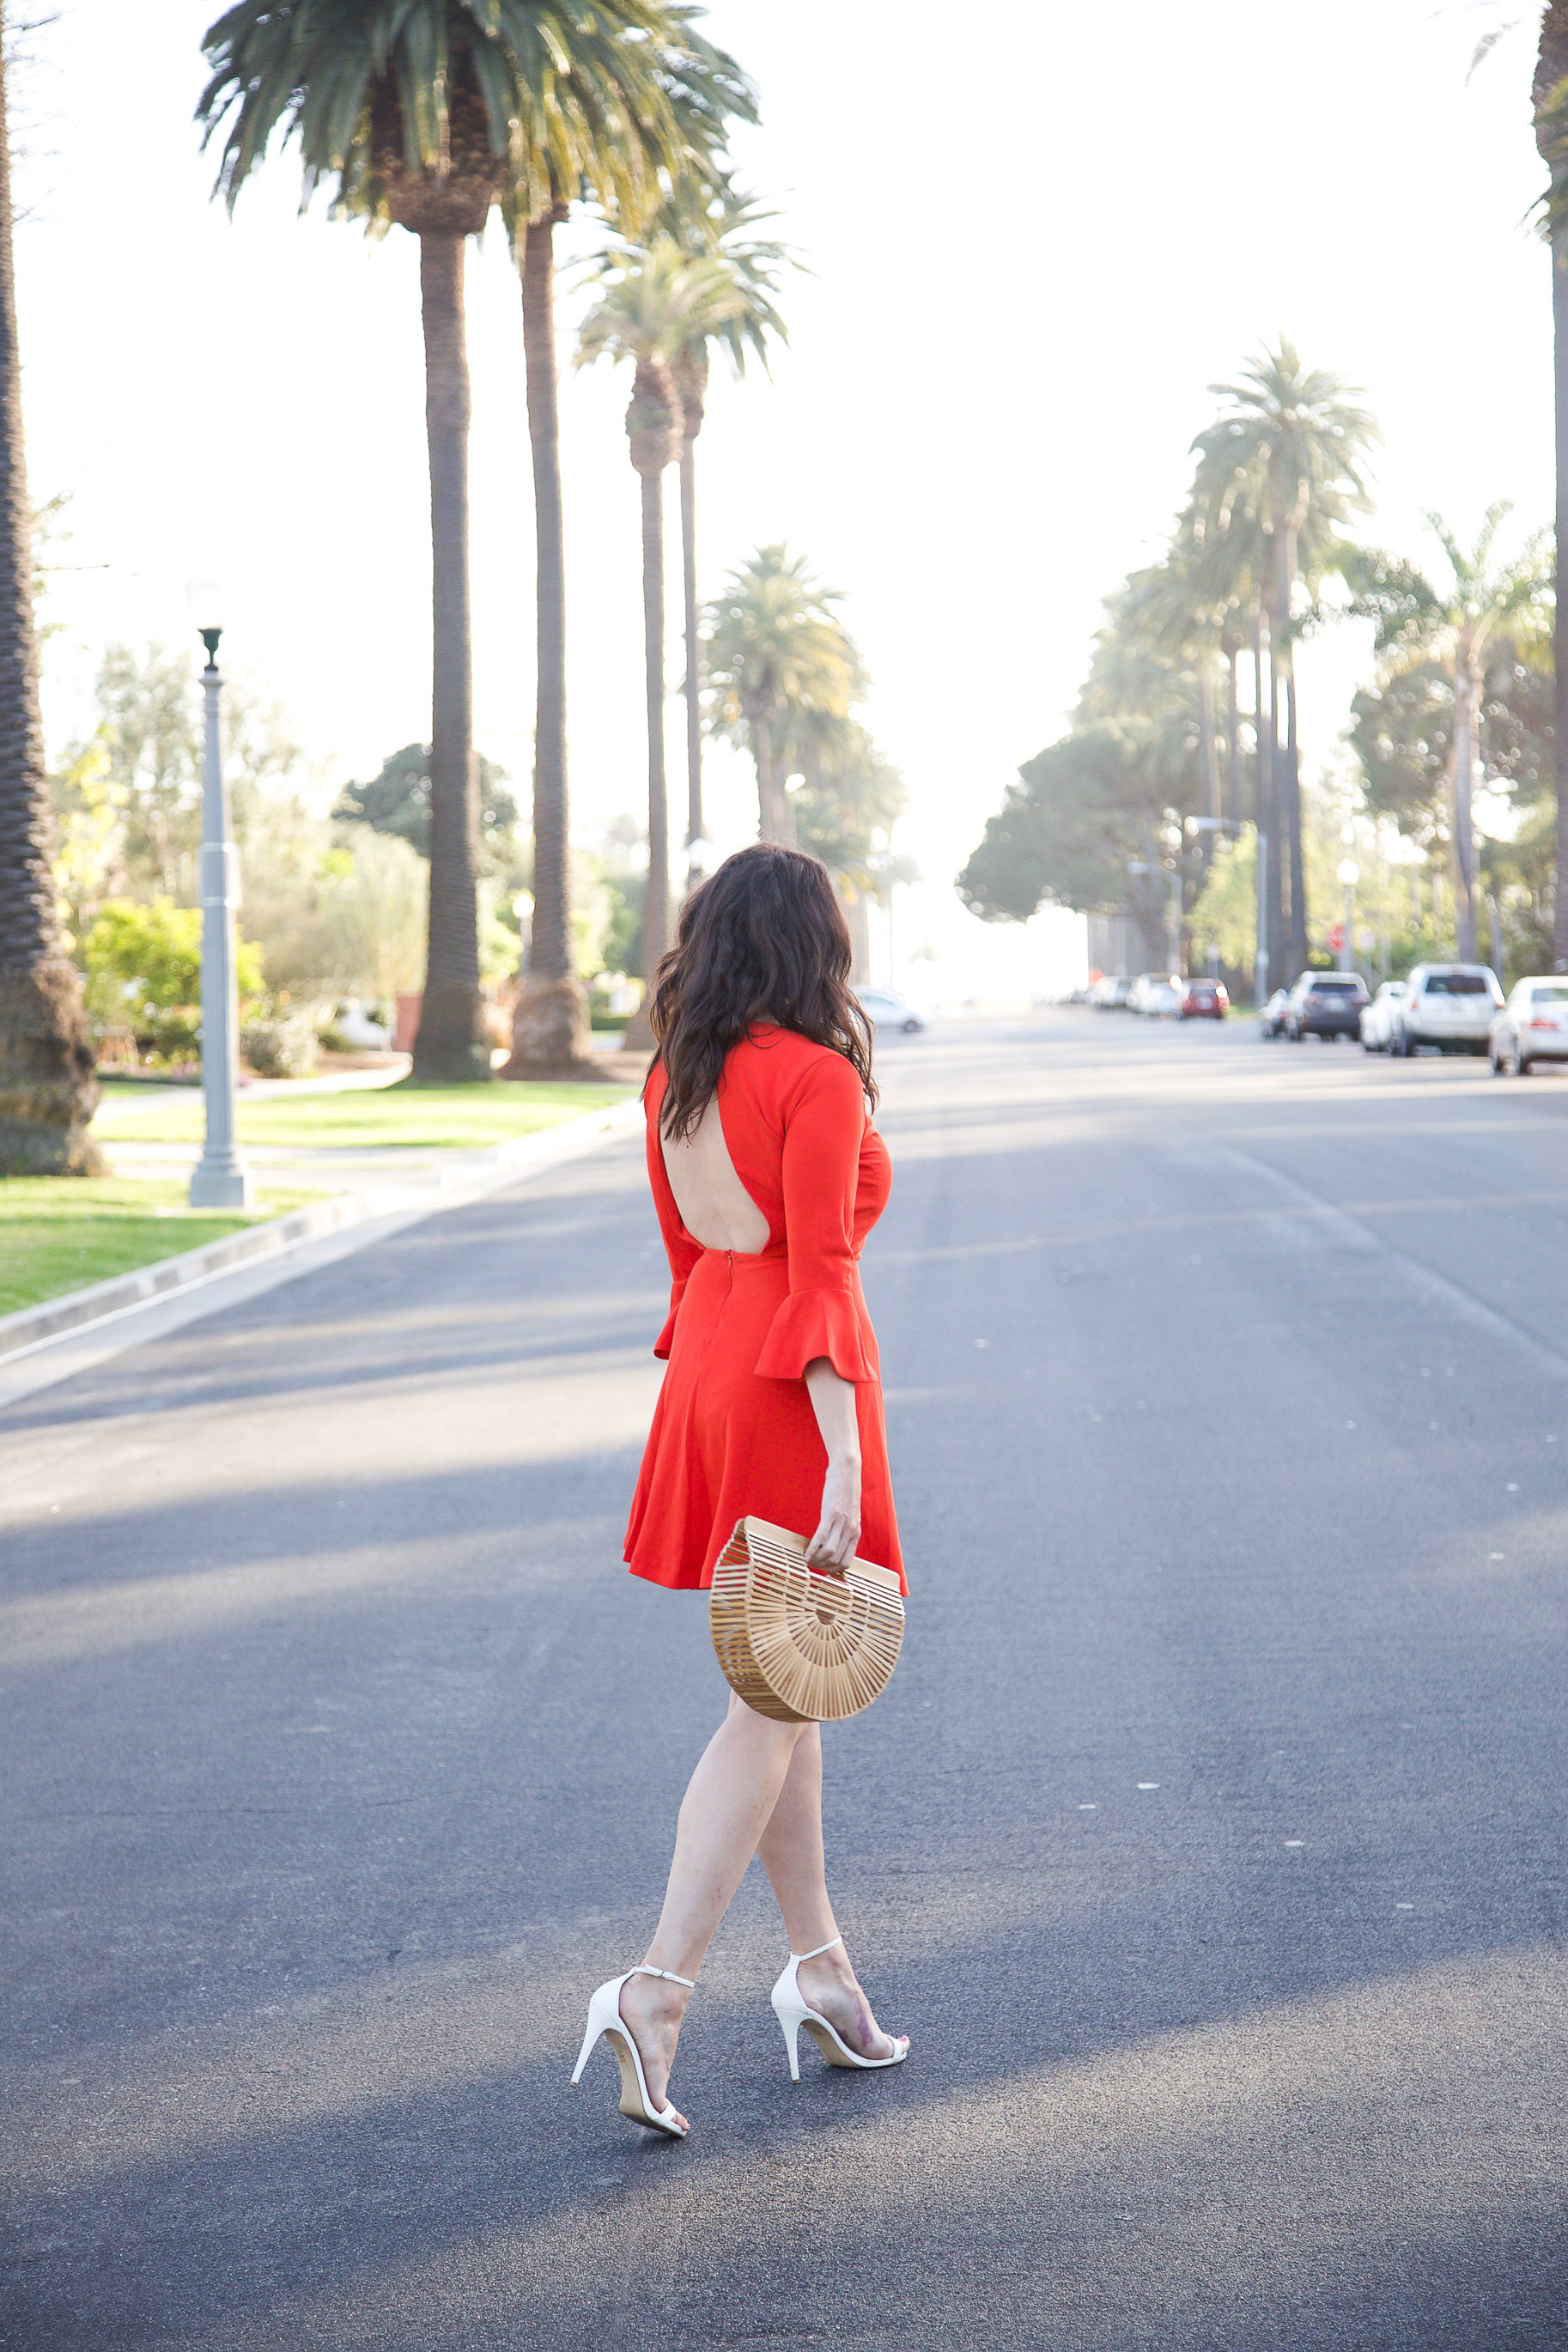 Lucy-Paris-Red-Bell-Sleeved-Dress5.jpg